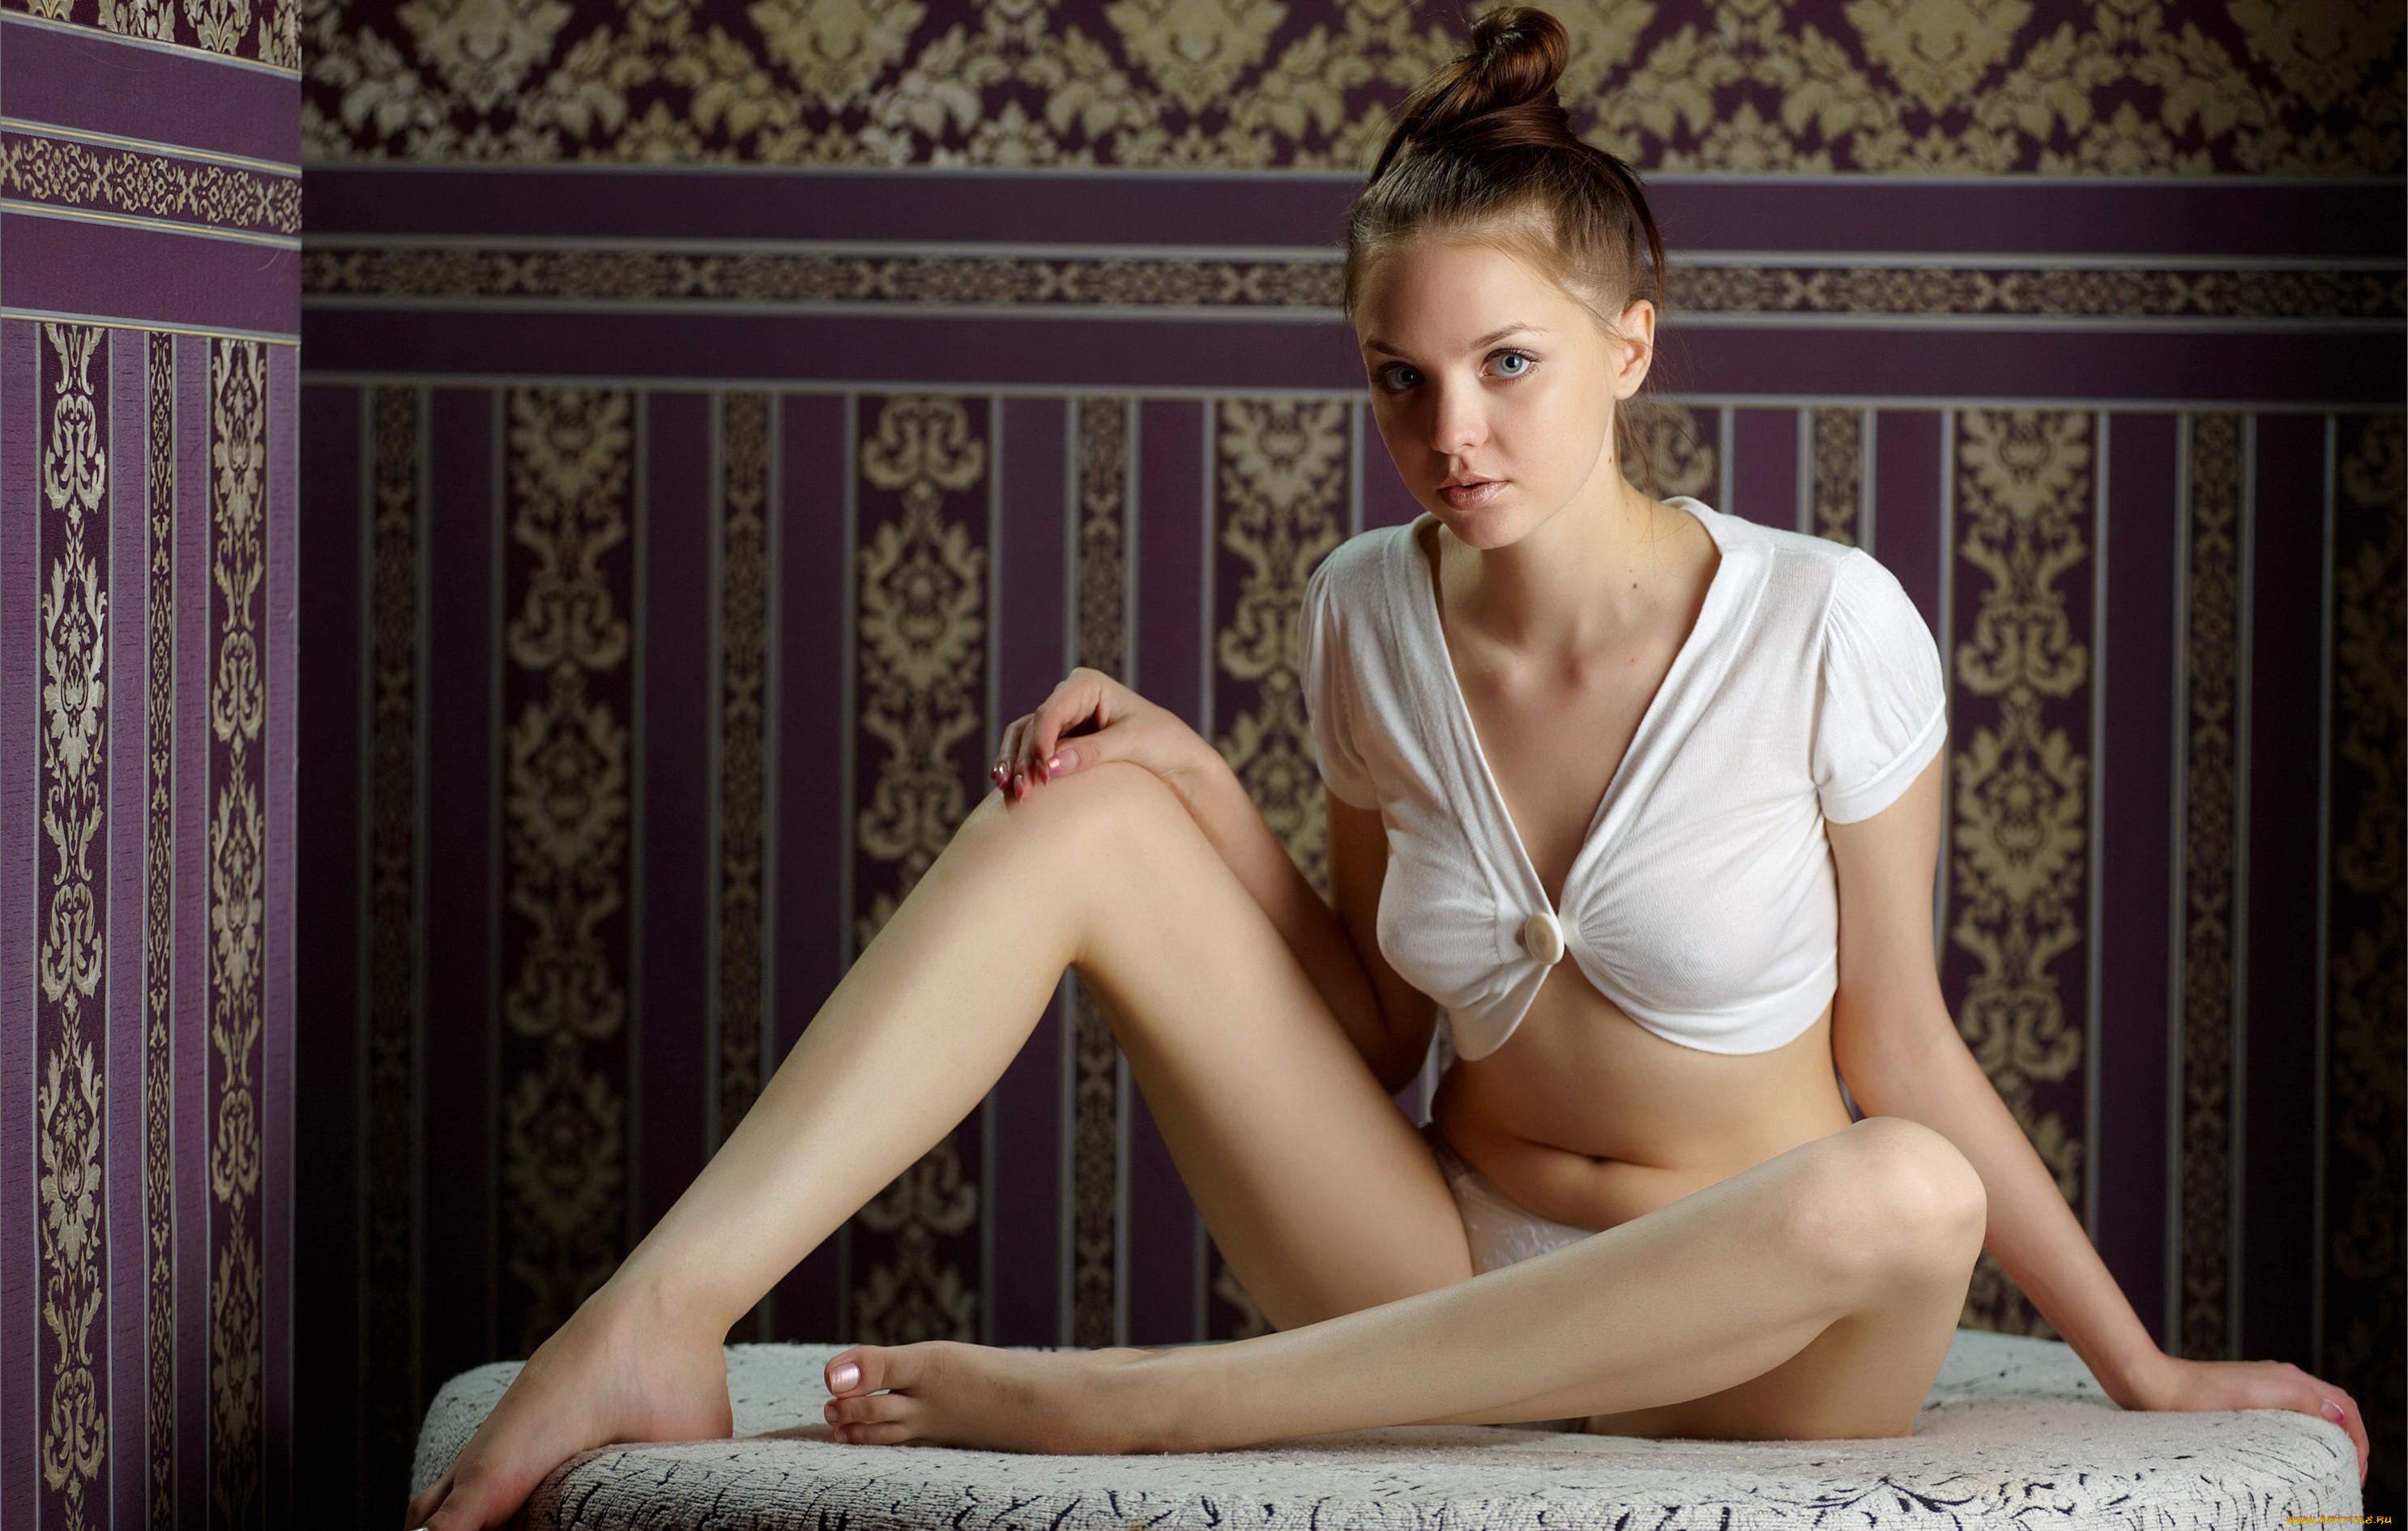 Amelie юлия эротика